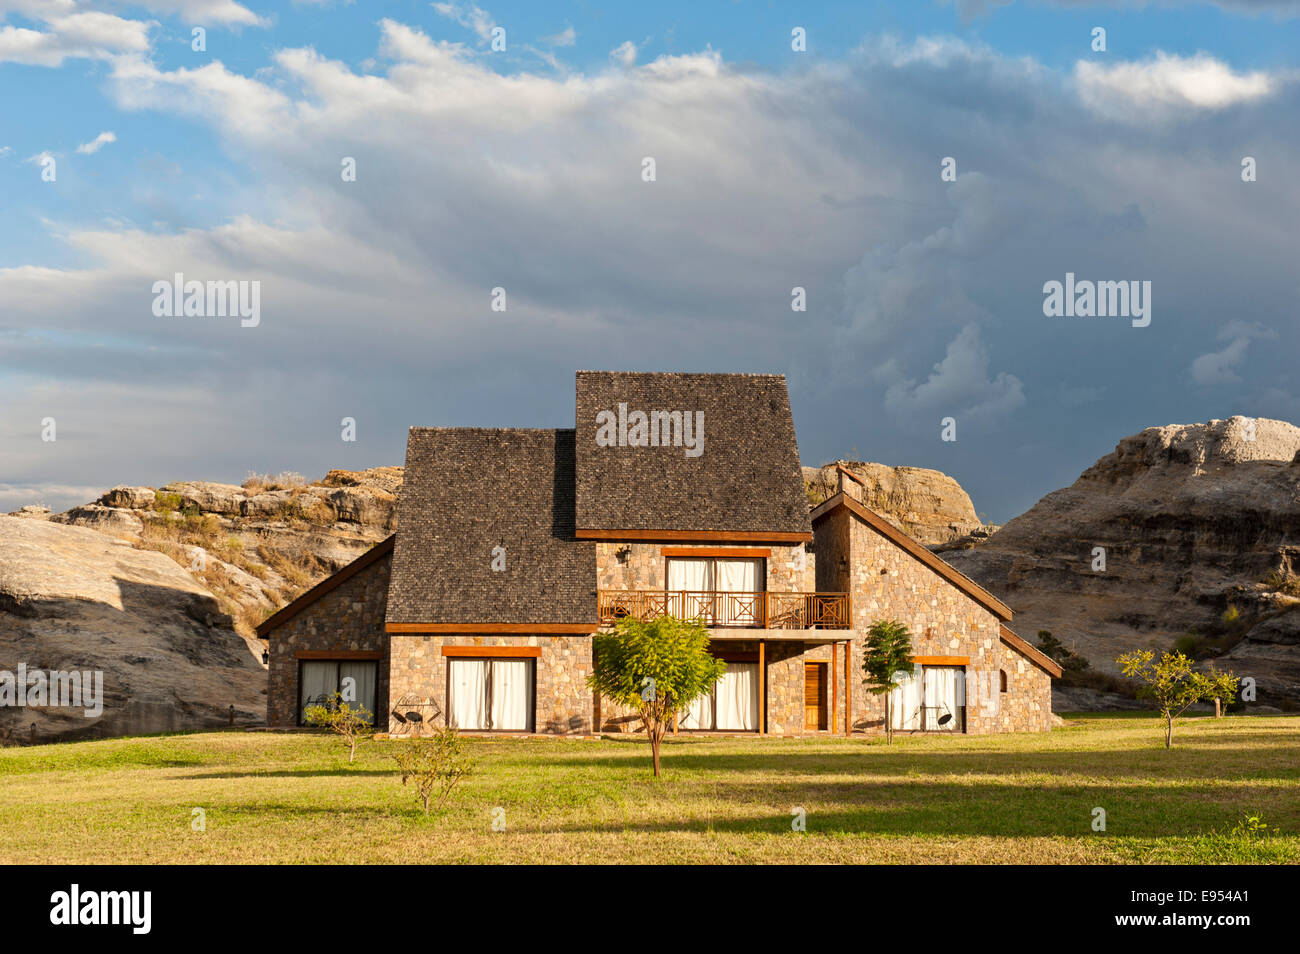 Casa de apartamentos, de arquitectura moderna, el Hotel Jardin de Roi, cerca de Ranohira, Madagascar Imagen De Stock